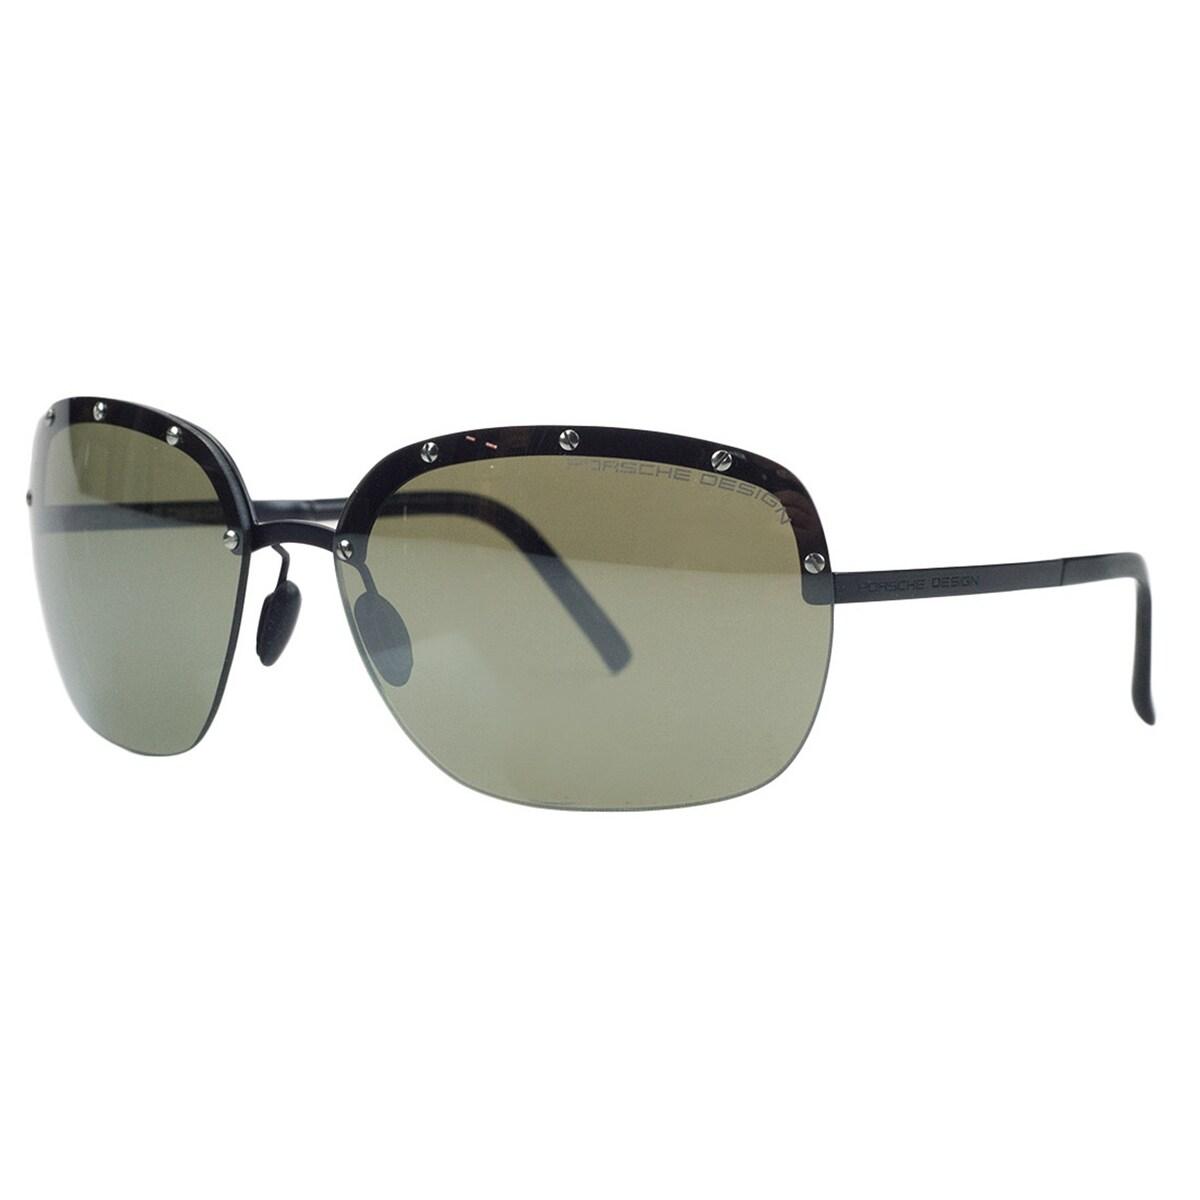 4f4d8e2581 Shop Porsche P8576-C Black Square Sunglasses - 65-15-135 - Free ...